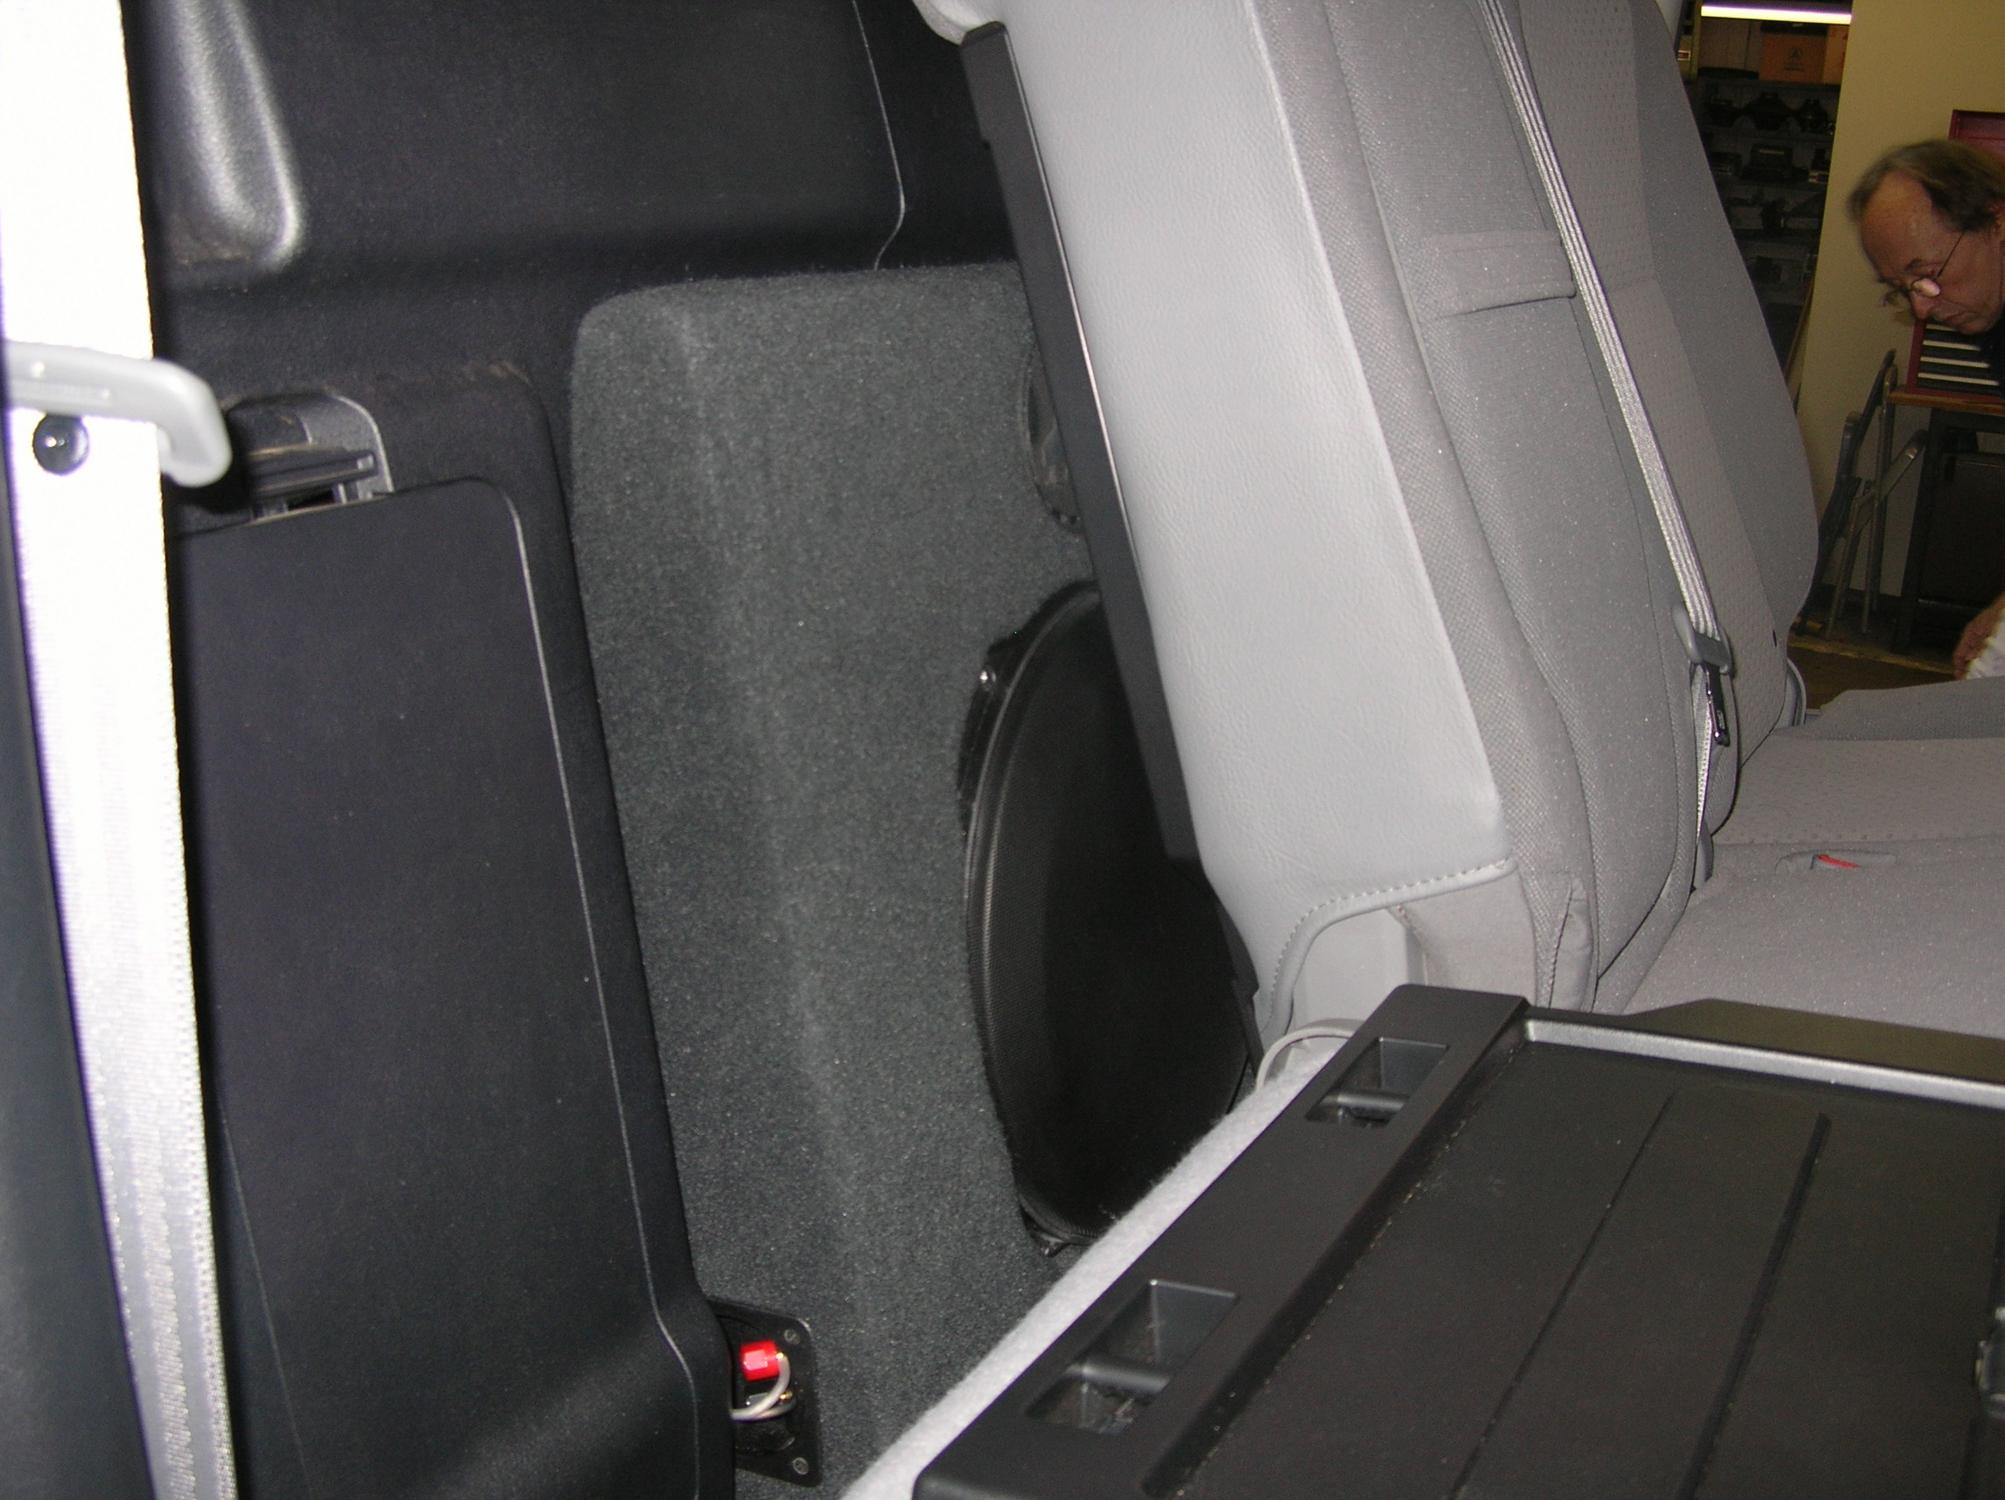 2008 Toyota Tundra Crewmax Build Santa Fe Auto Sound Vw Gti Fuse Box And Discription Jl Audoi 13tw5 Stealthboxes Stealthbox Behind Rear Seat